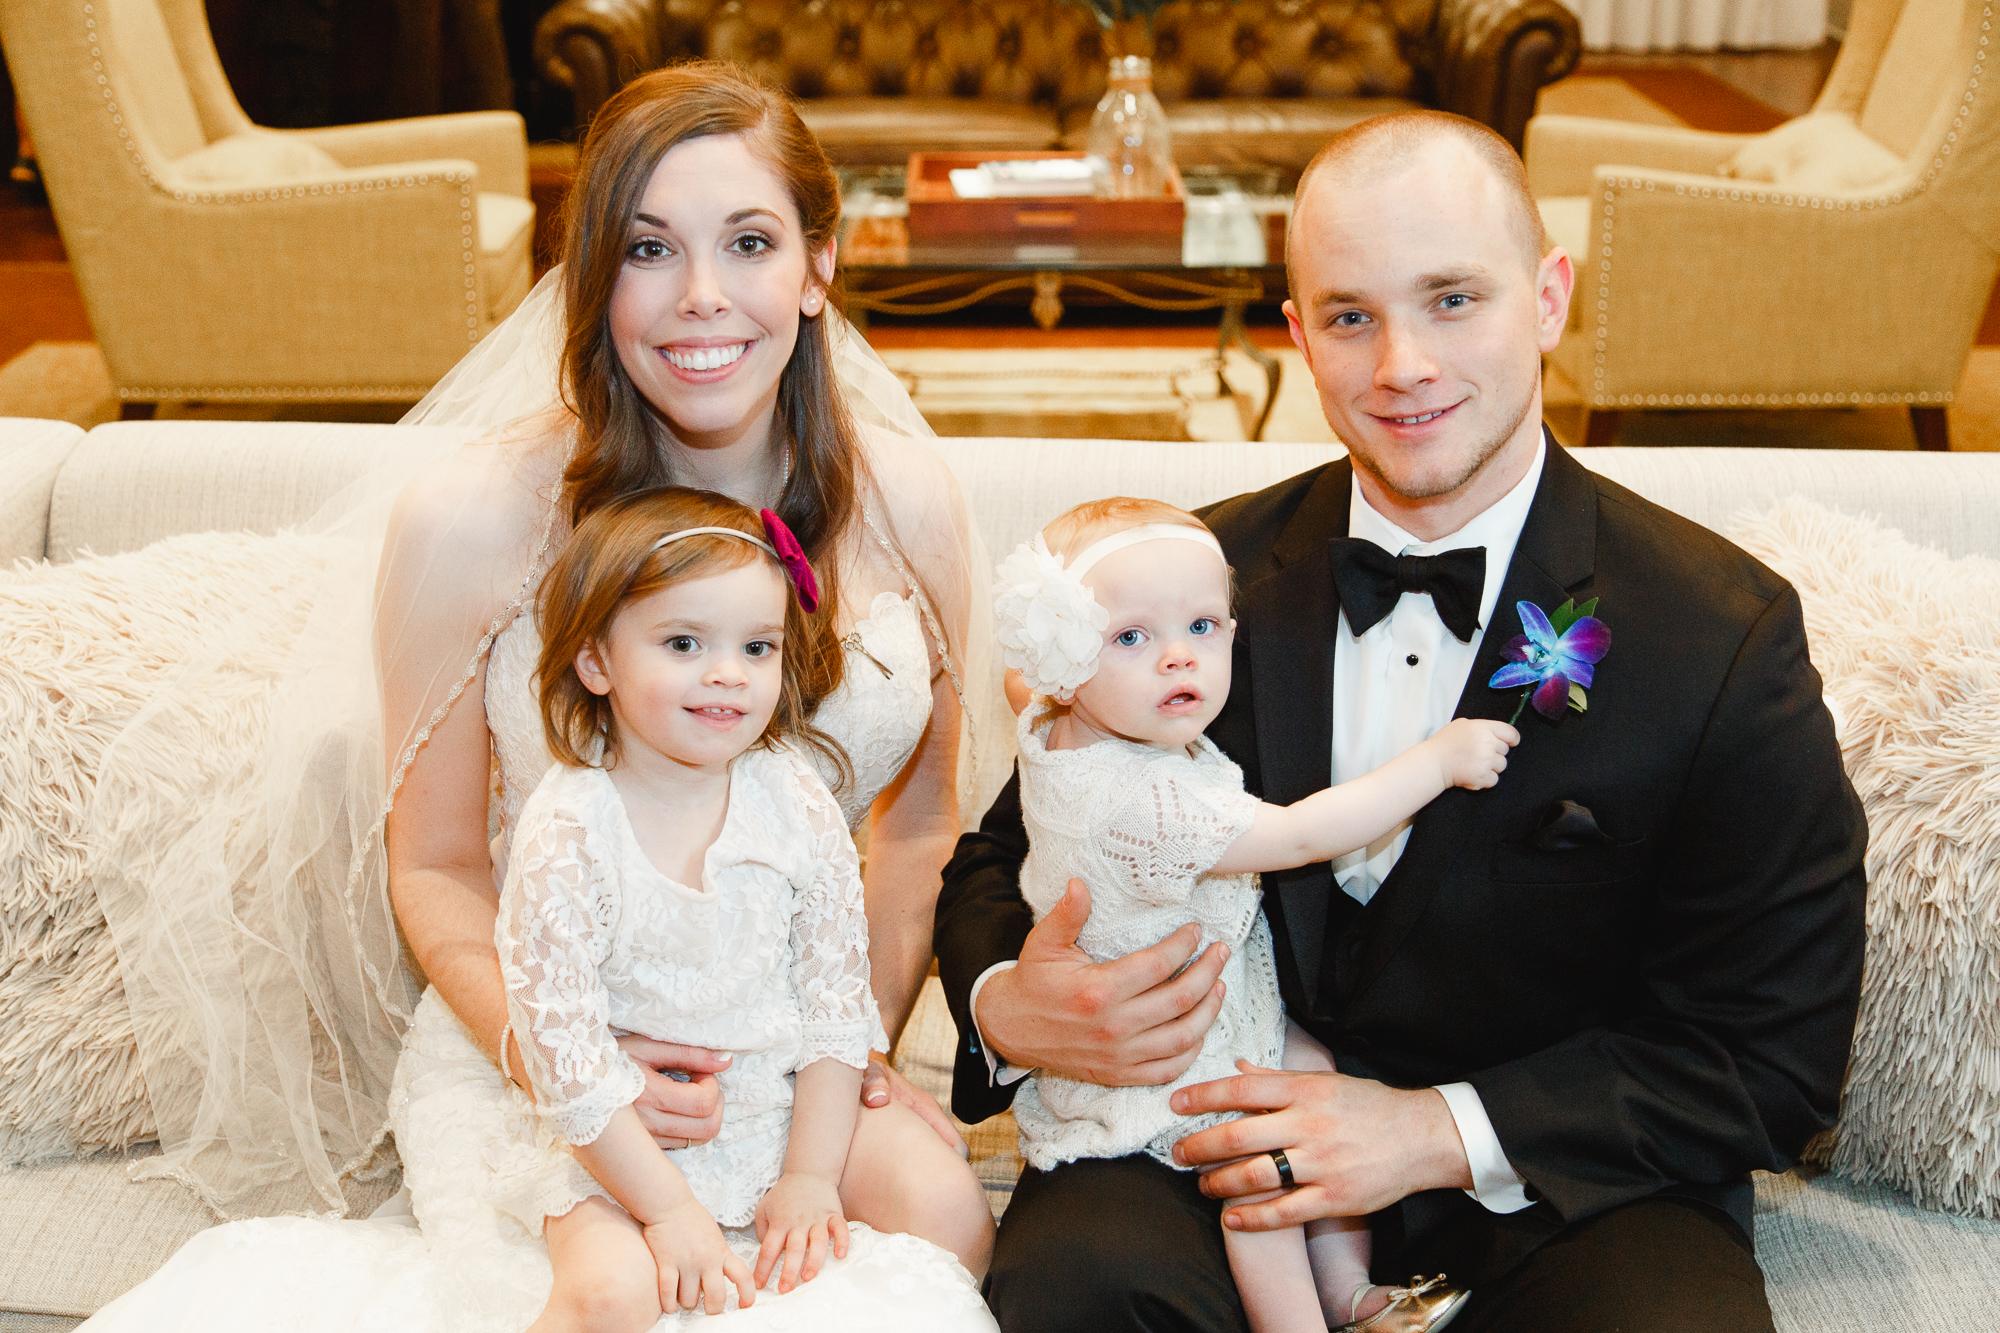 a-columbus-wedding-family-indoor-photography-1.jpg